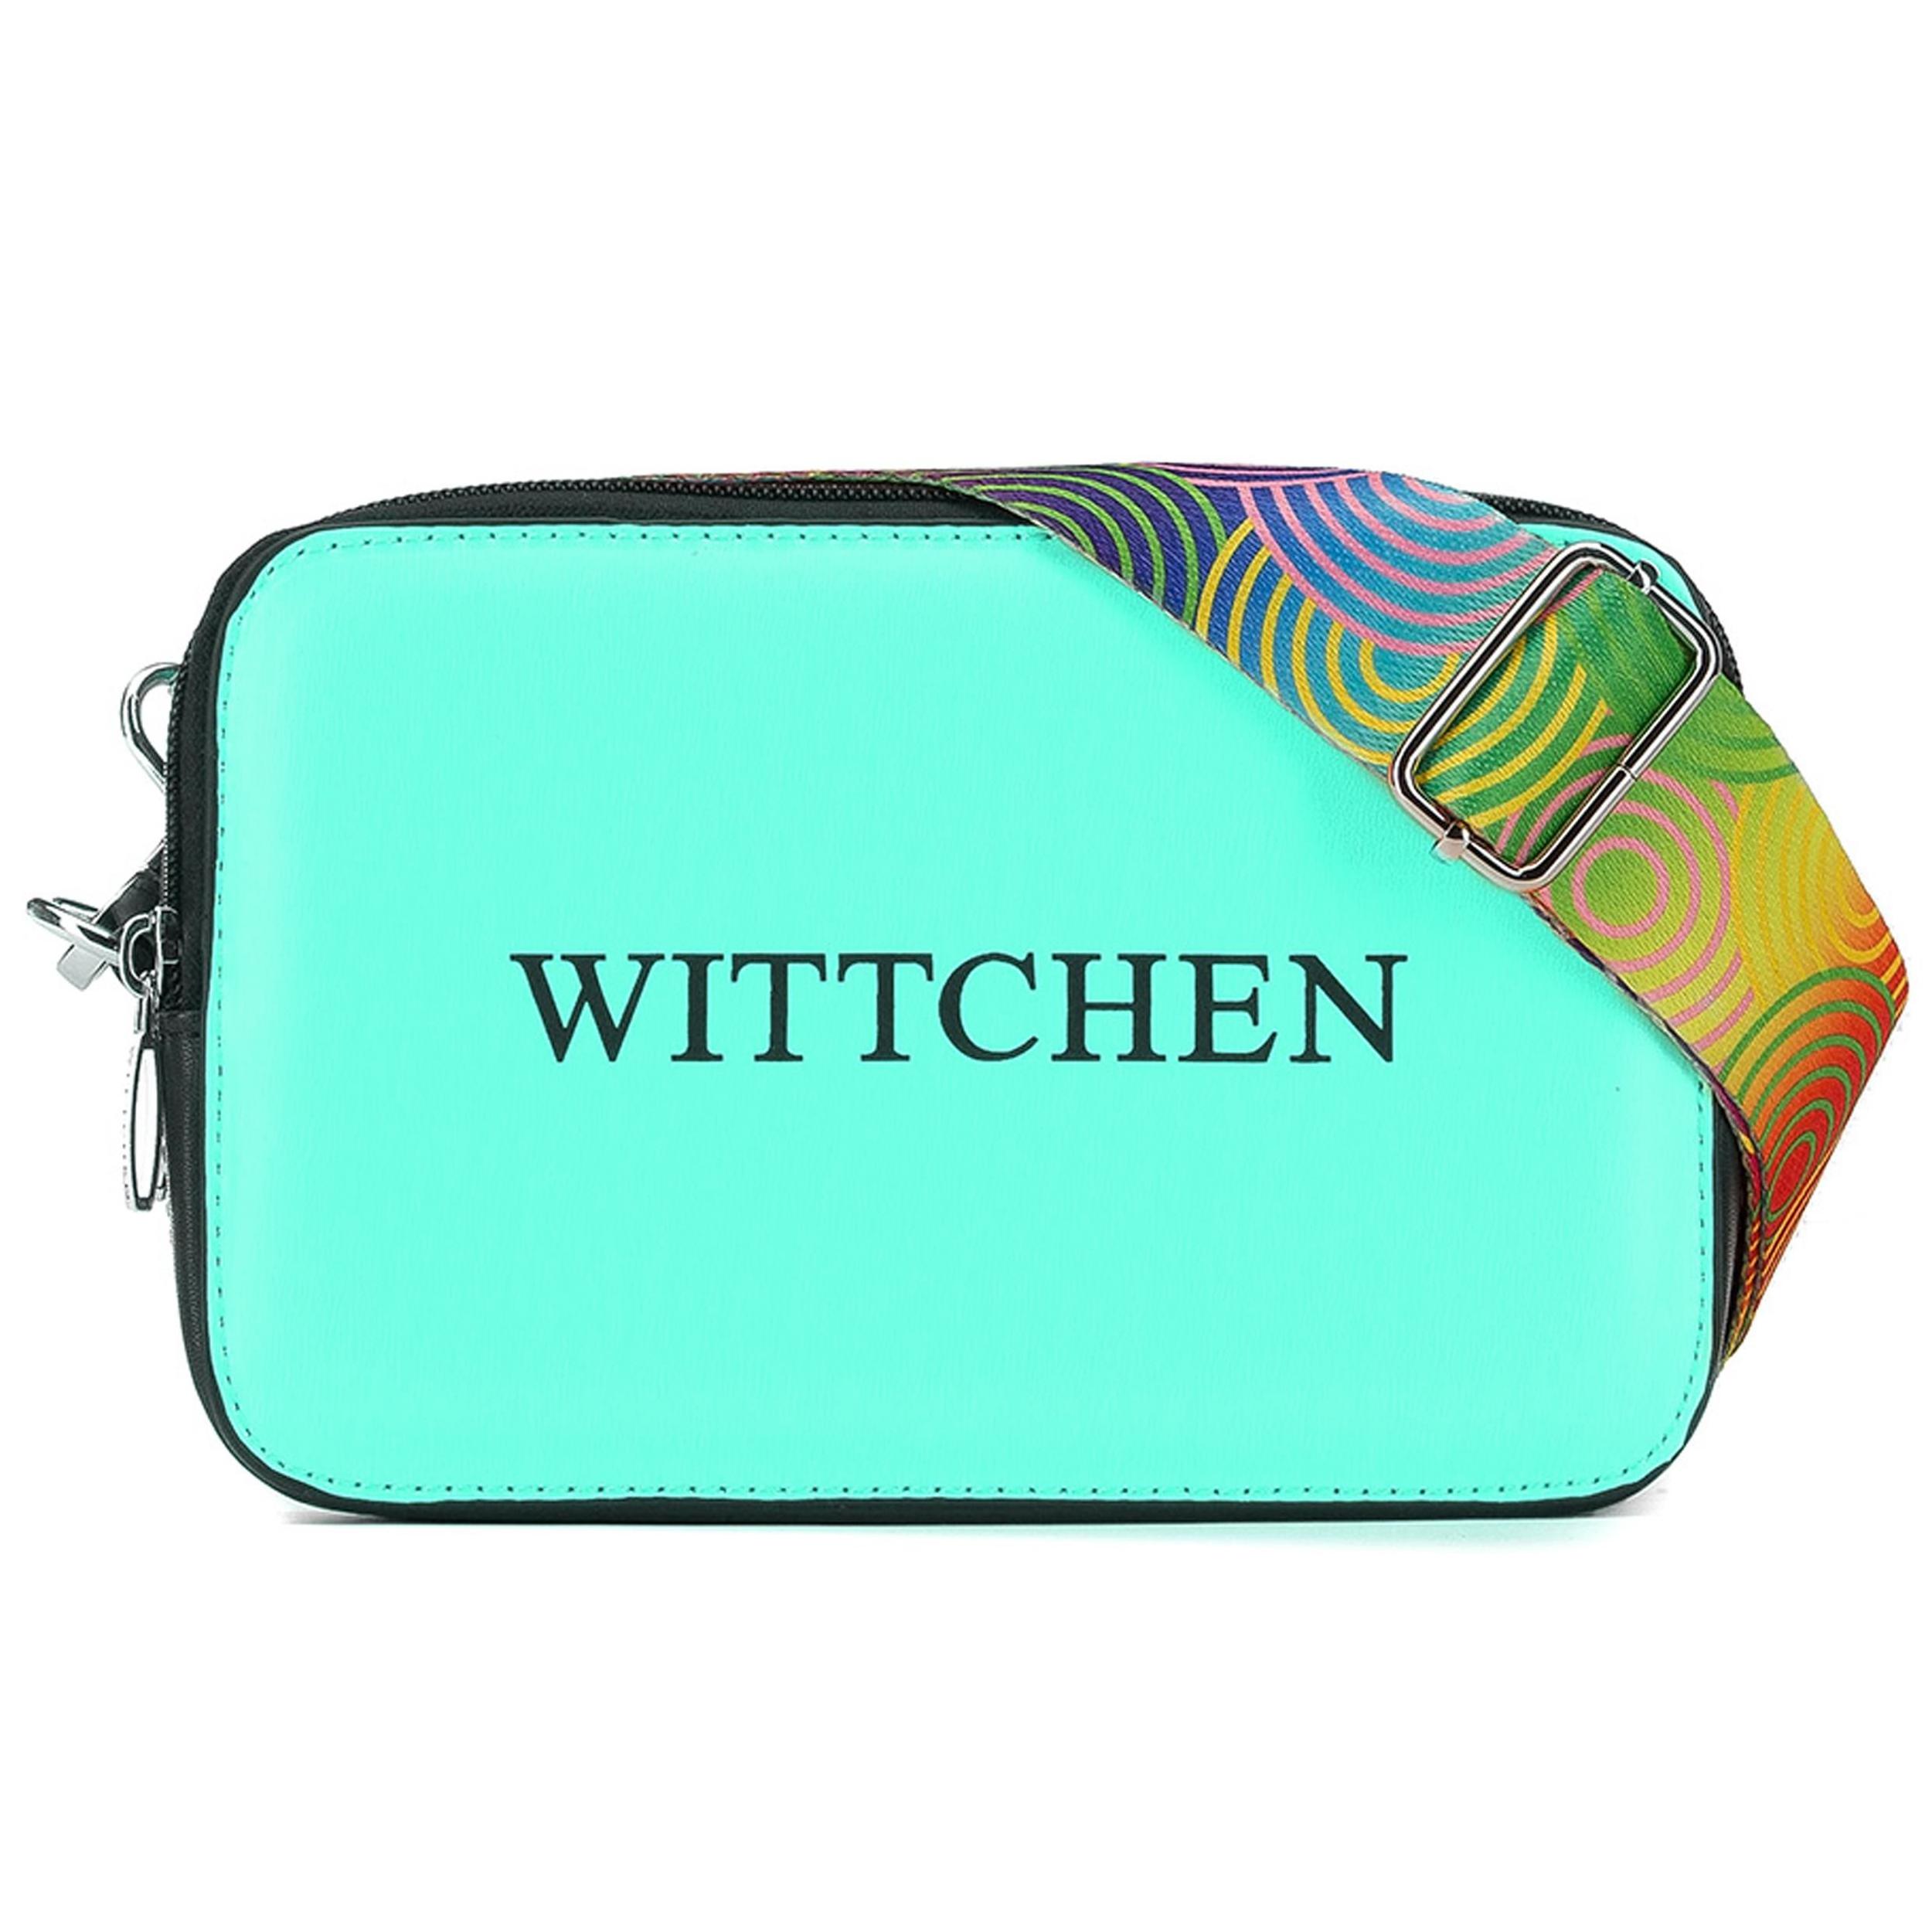 Wittchen torebki